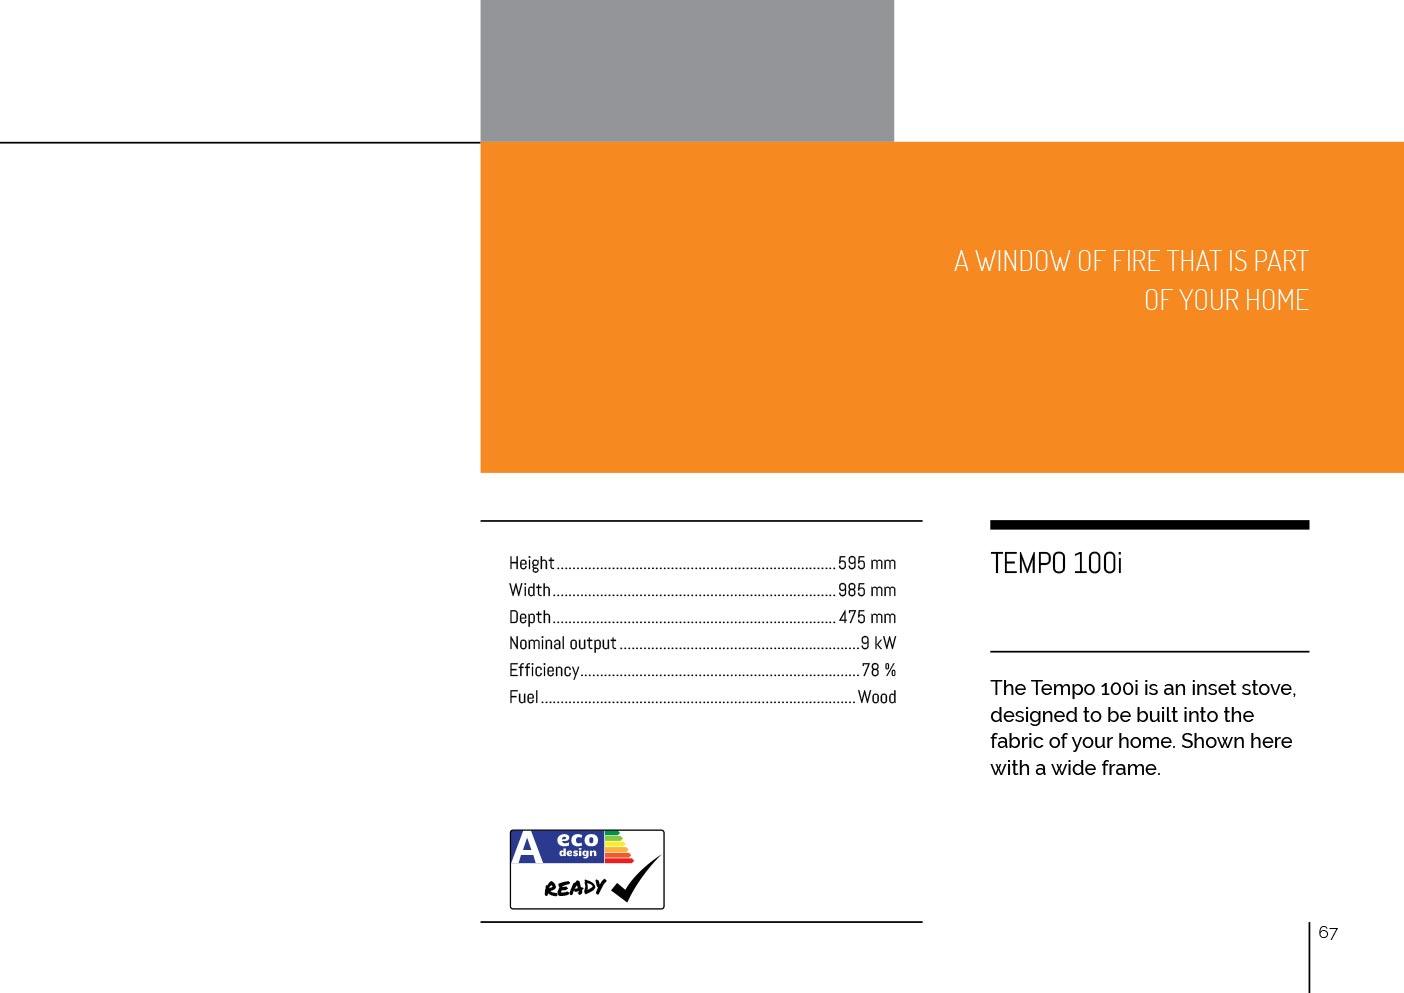 opus-stoves-brochure-(2)-67